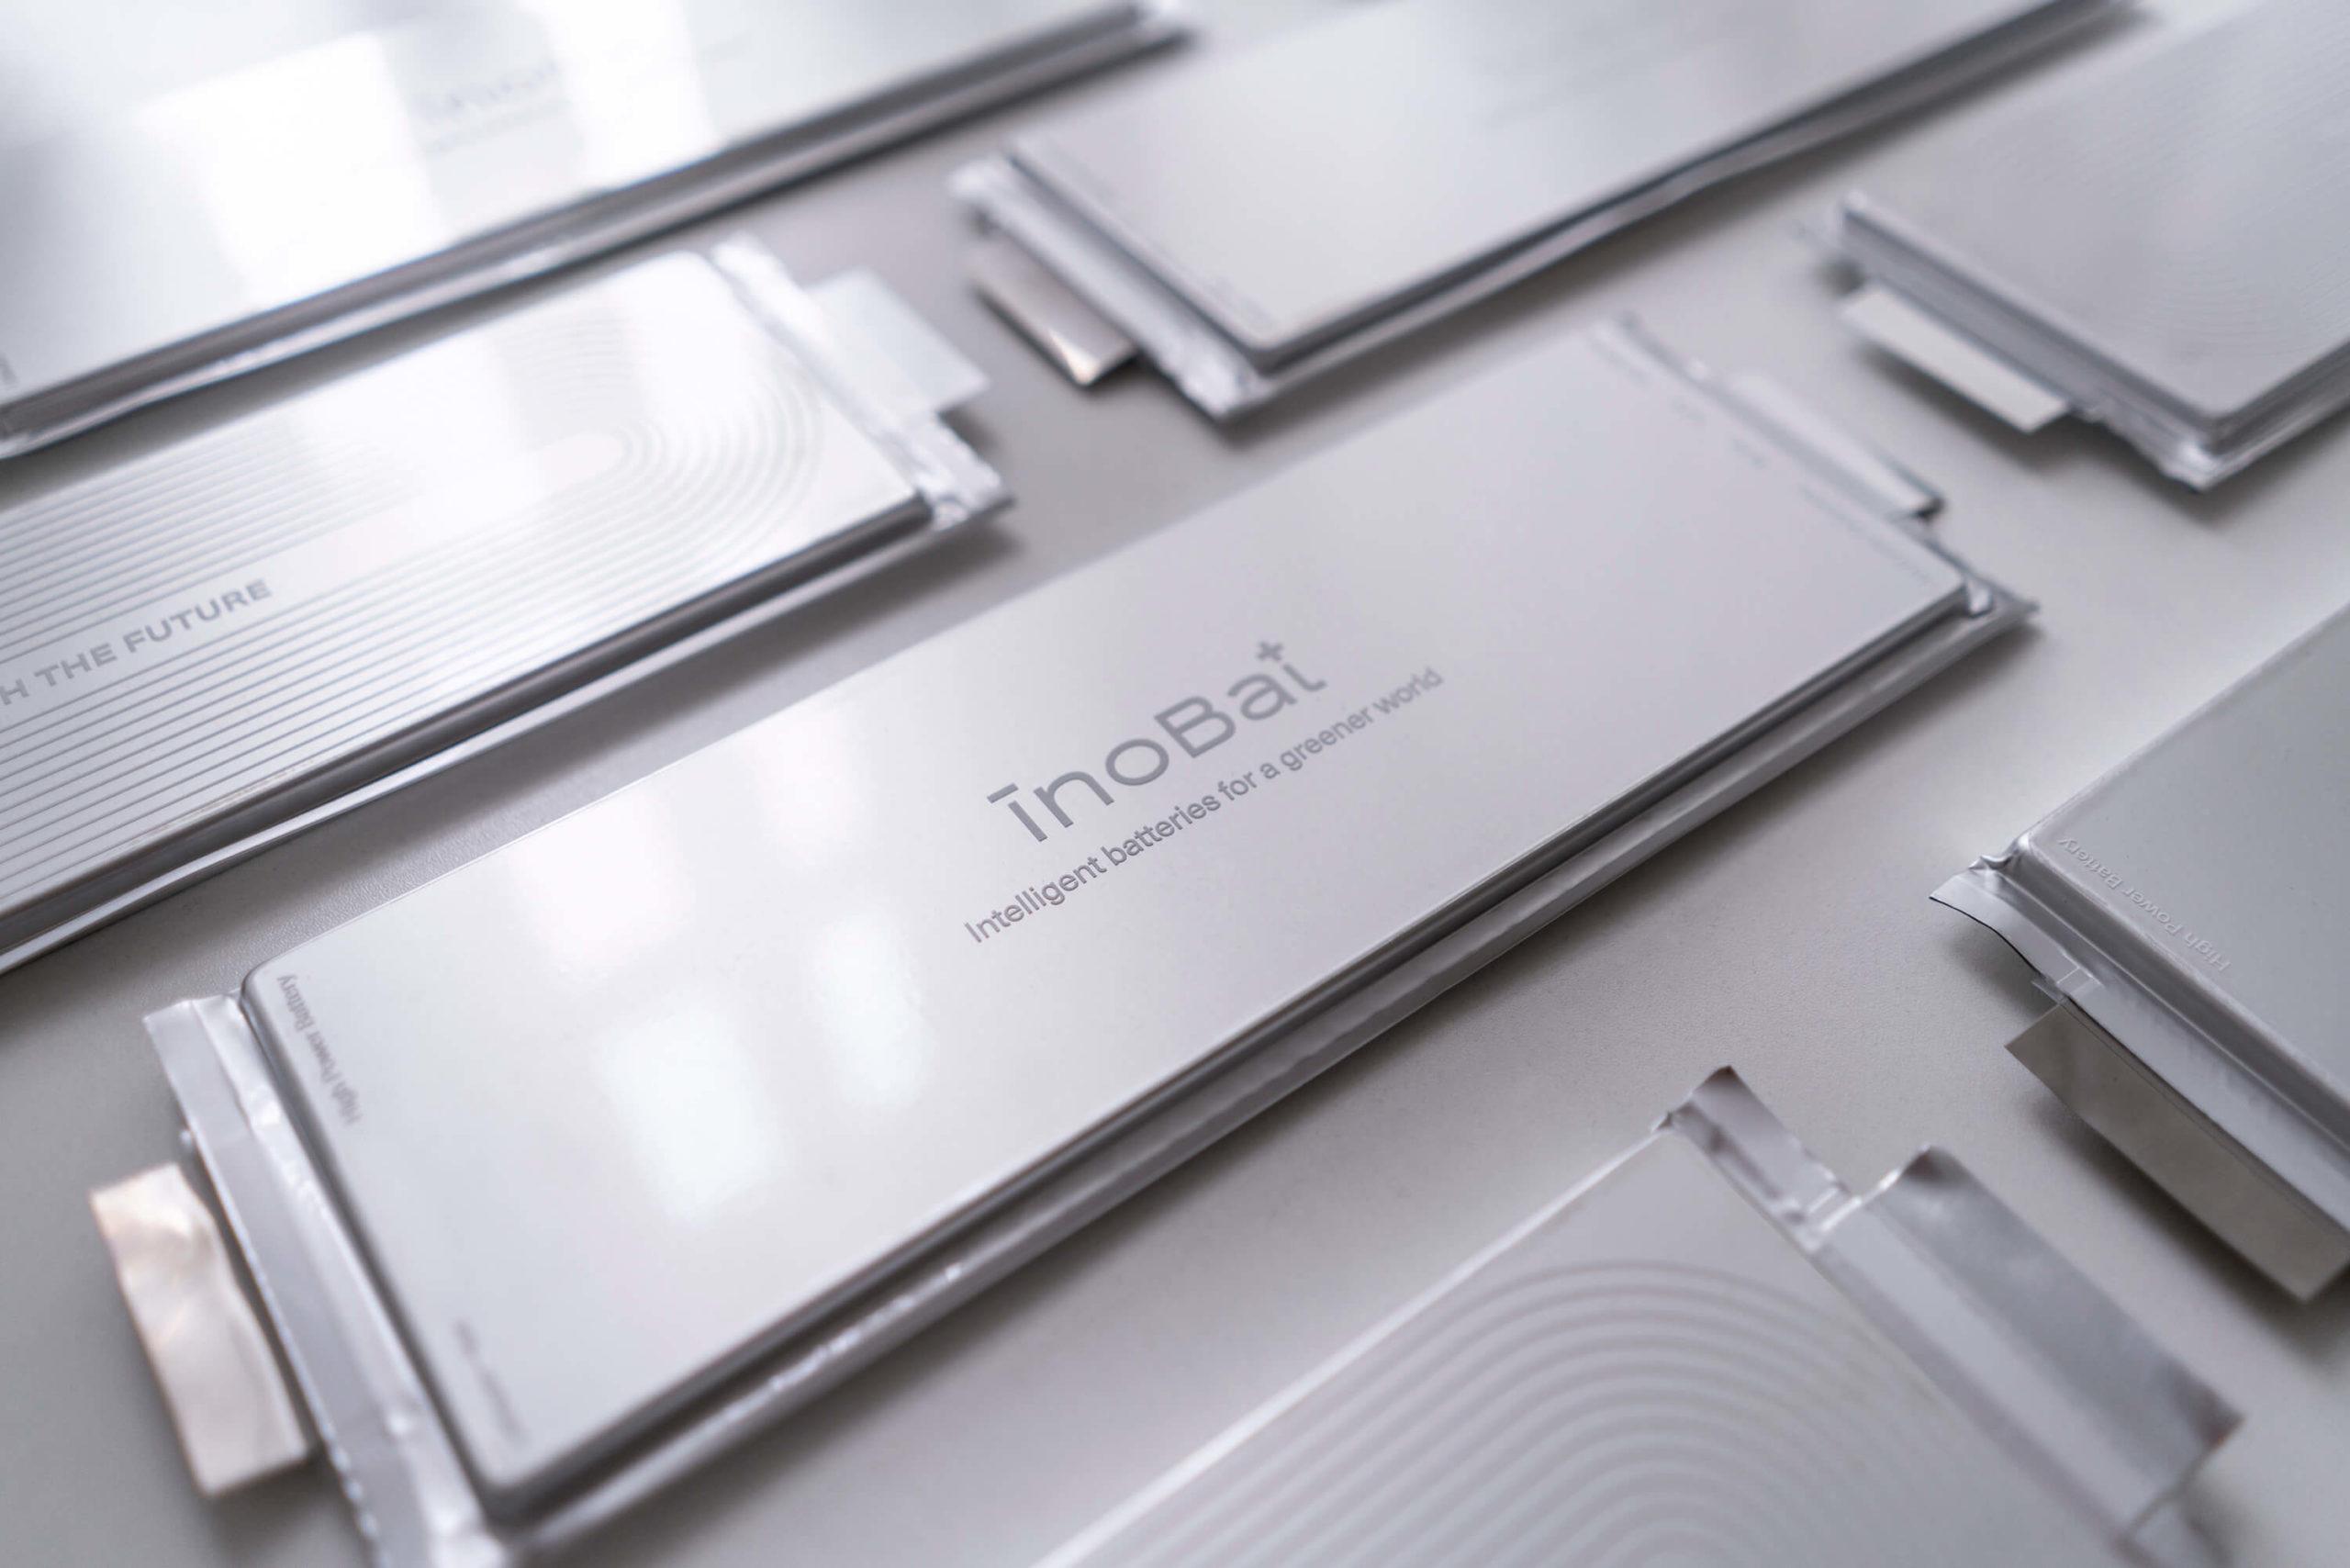 batterie intelligenti